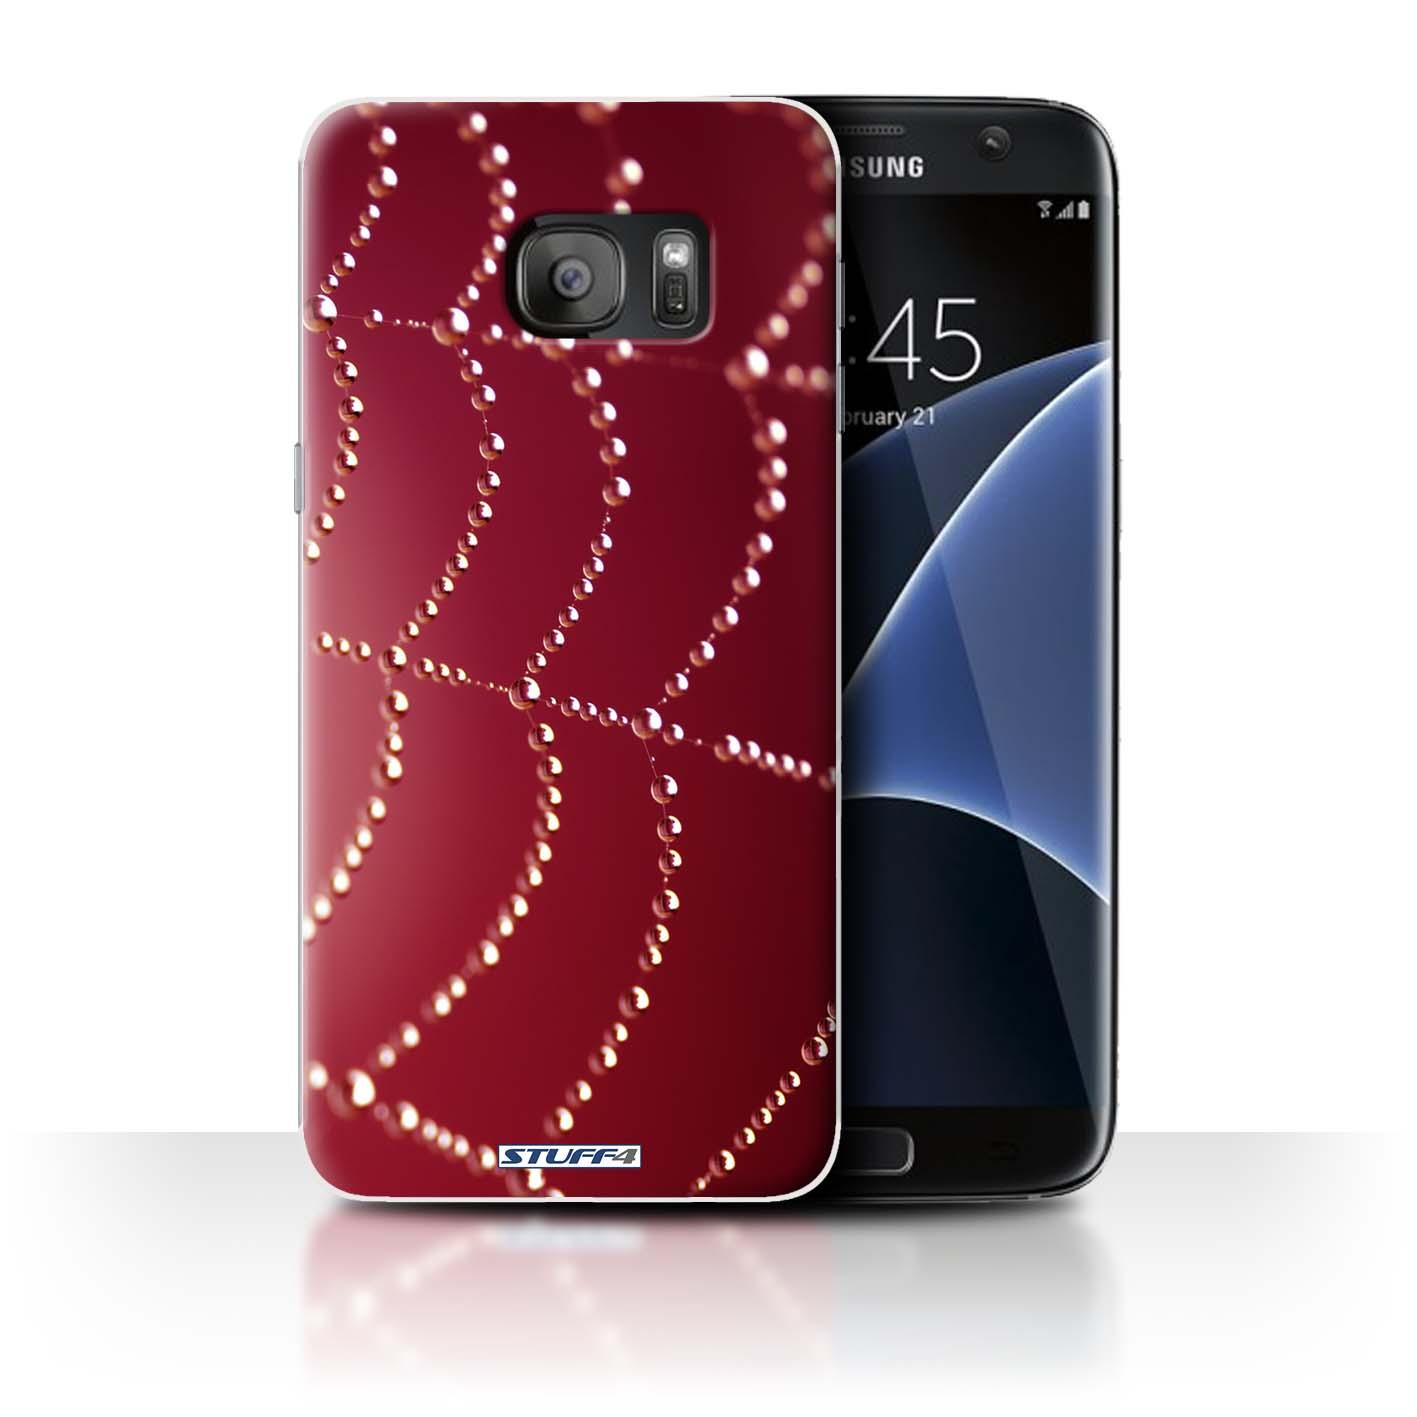 Coque-Etui-Housse-pour-Samsung-Galaxy-S7-Edge-G935-Toile-d-039-araignee-Perles